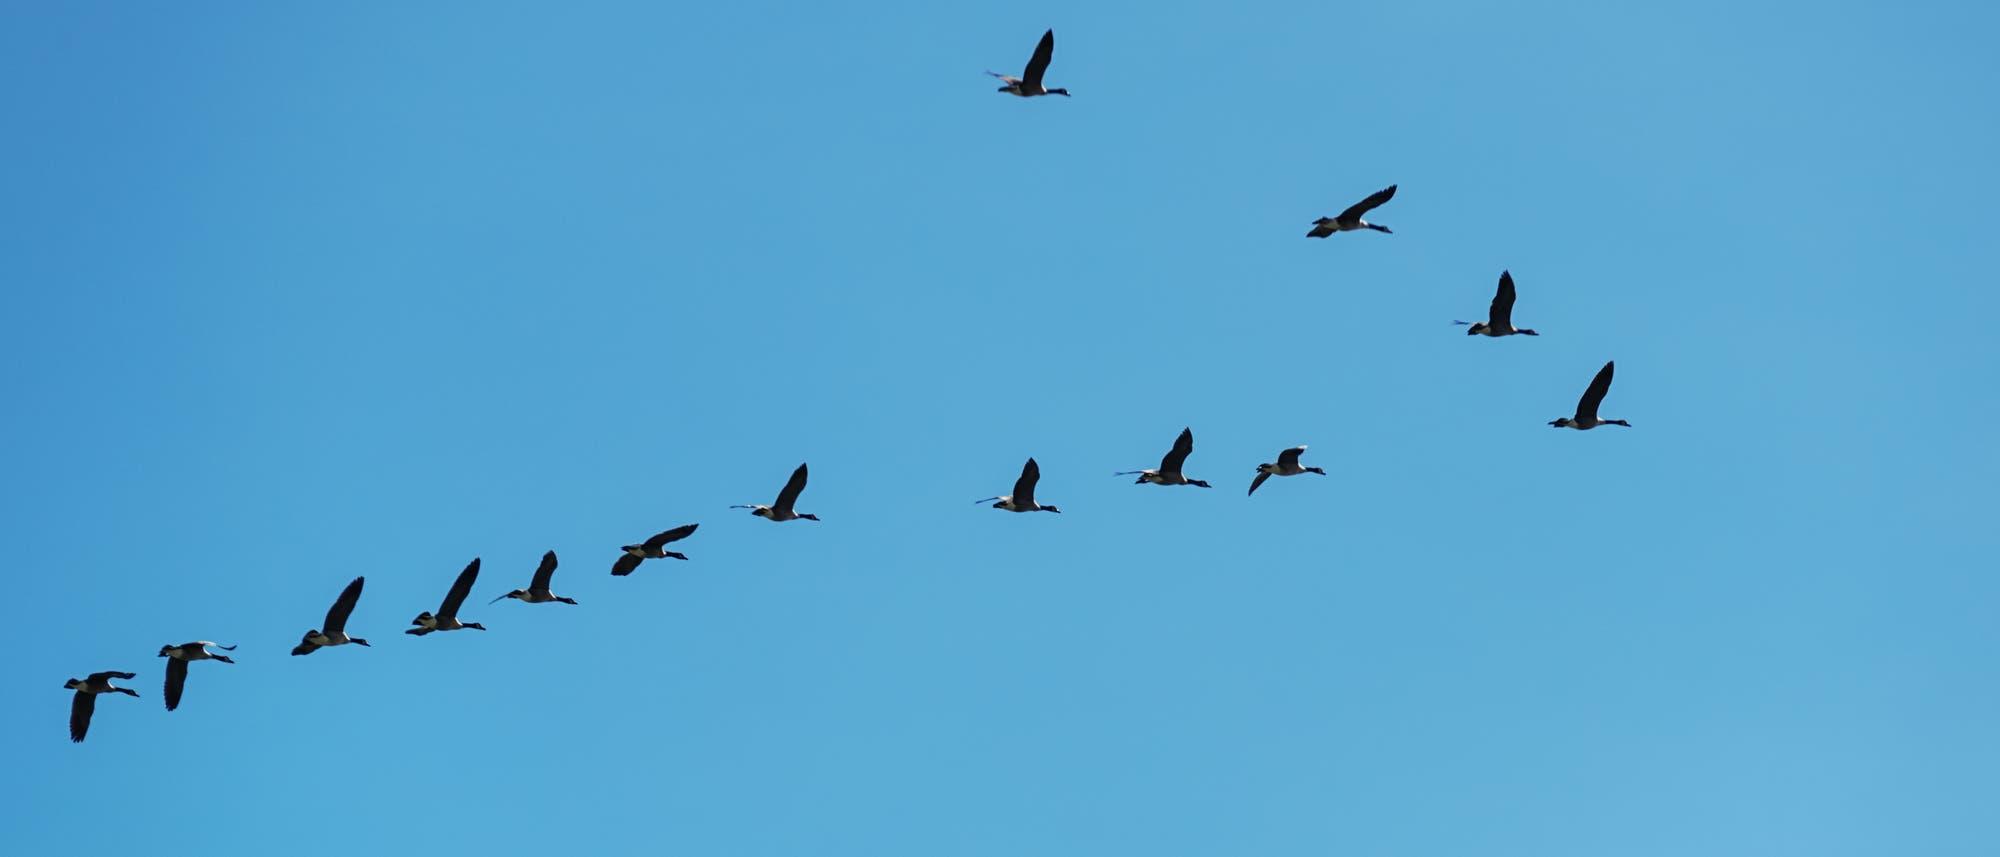 Mit Magnetsinn: Zugvögel